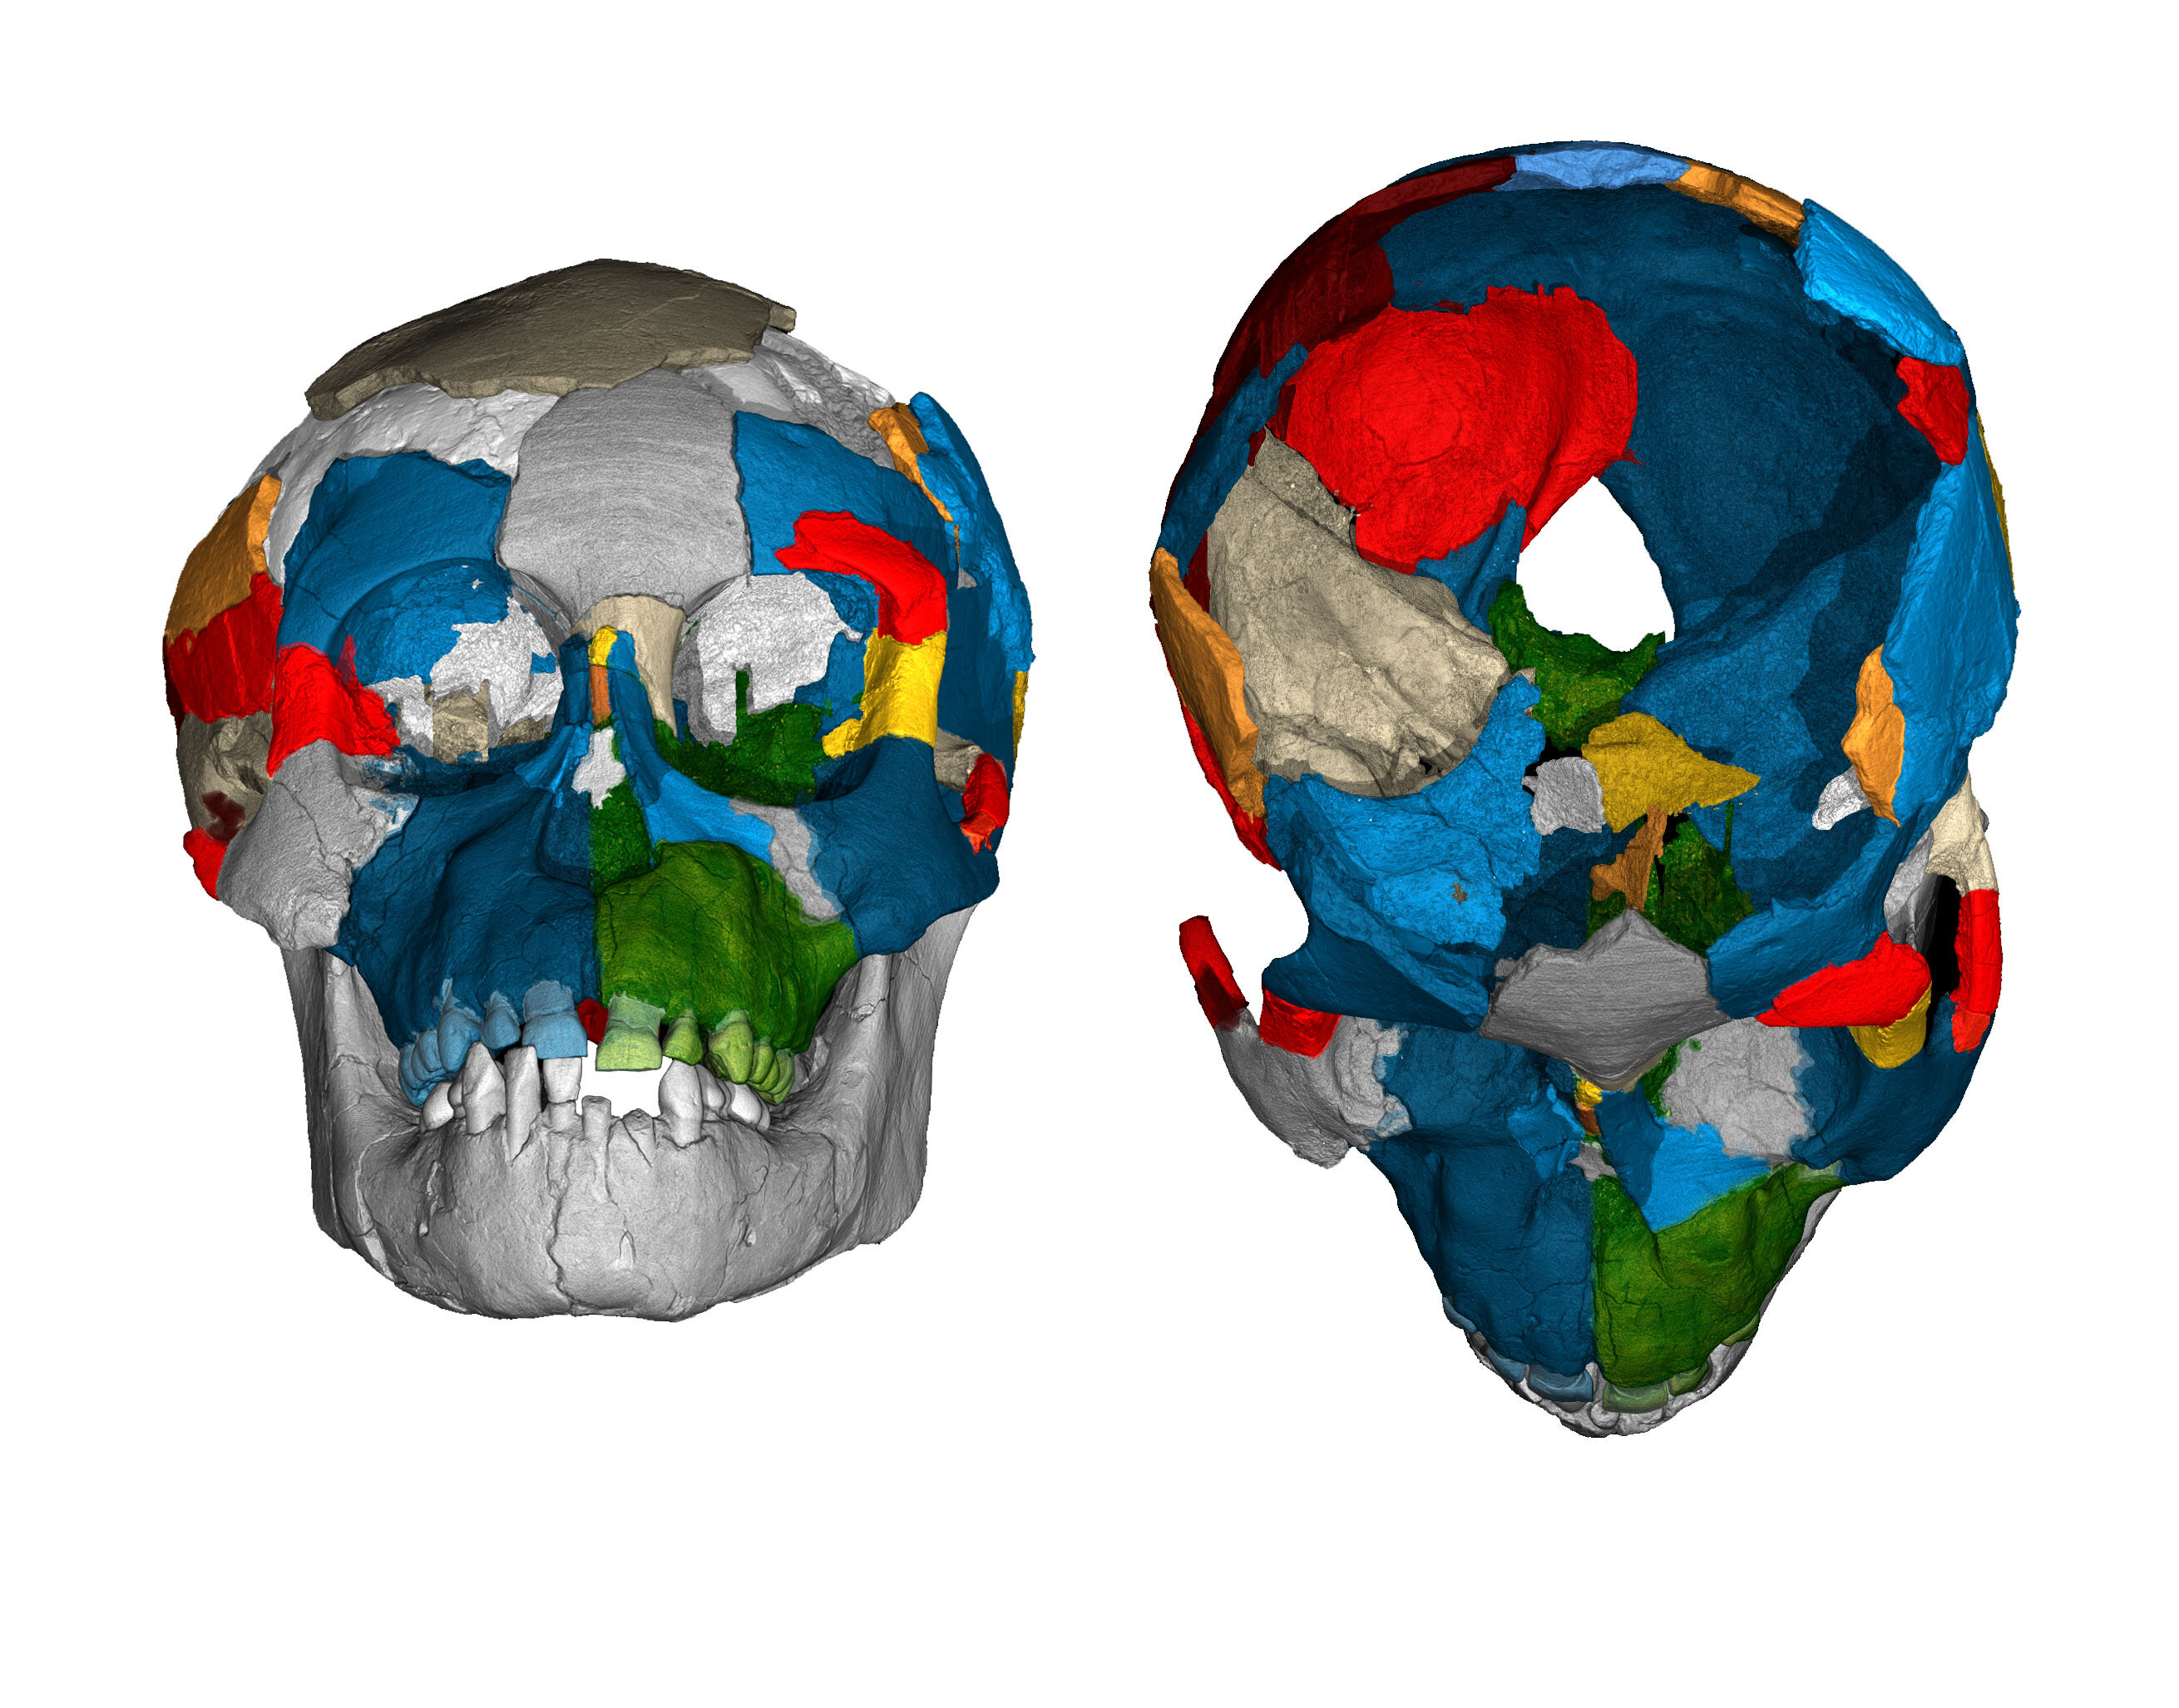 Skull scans reveal evolutionary secrets of fossil brains